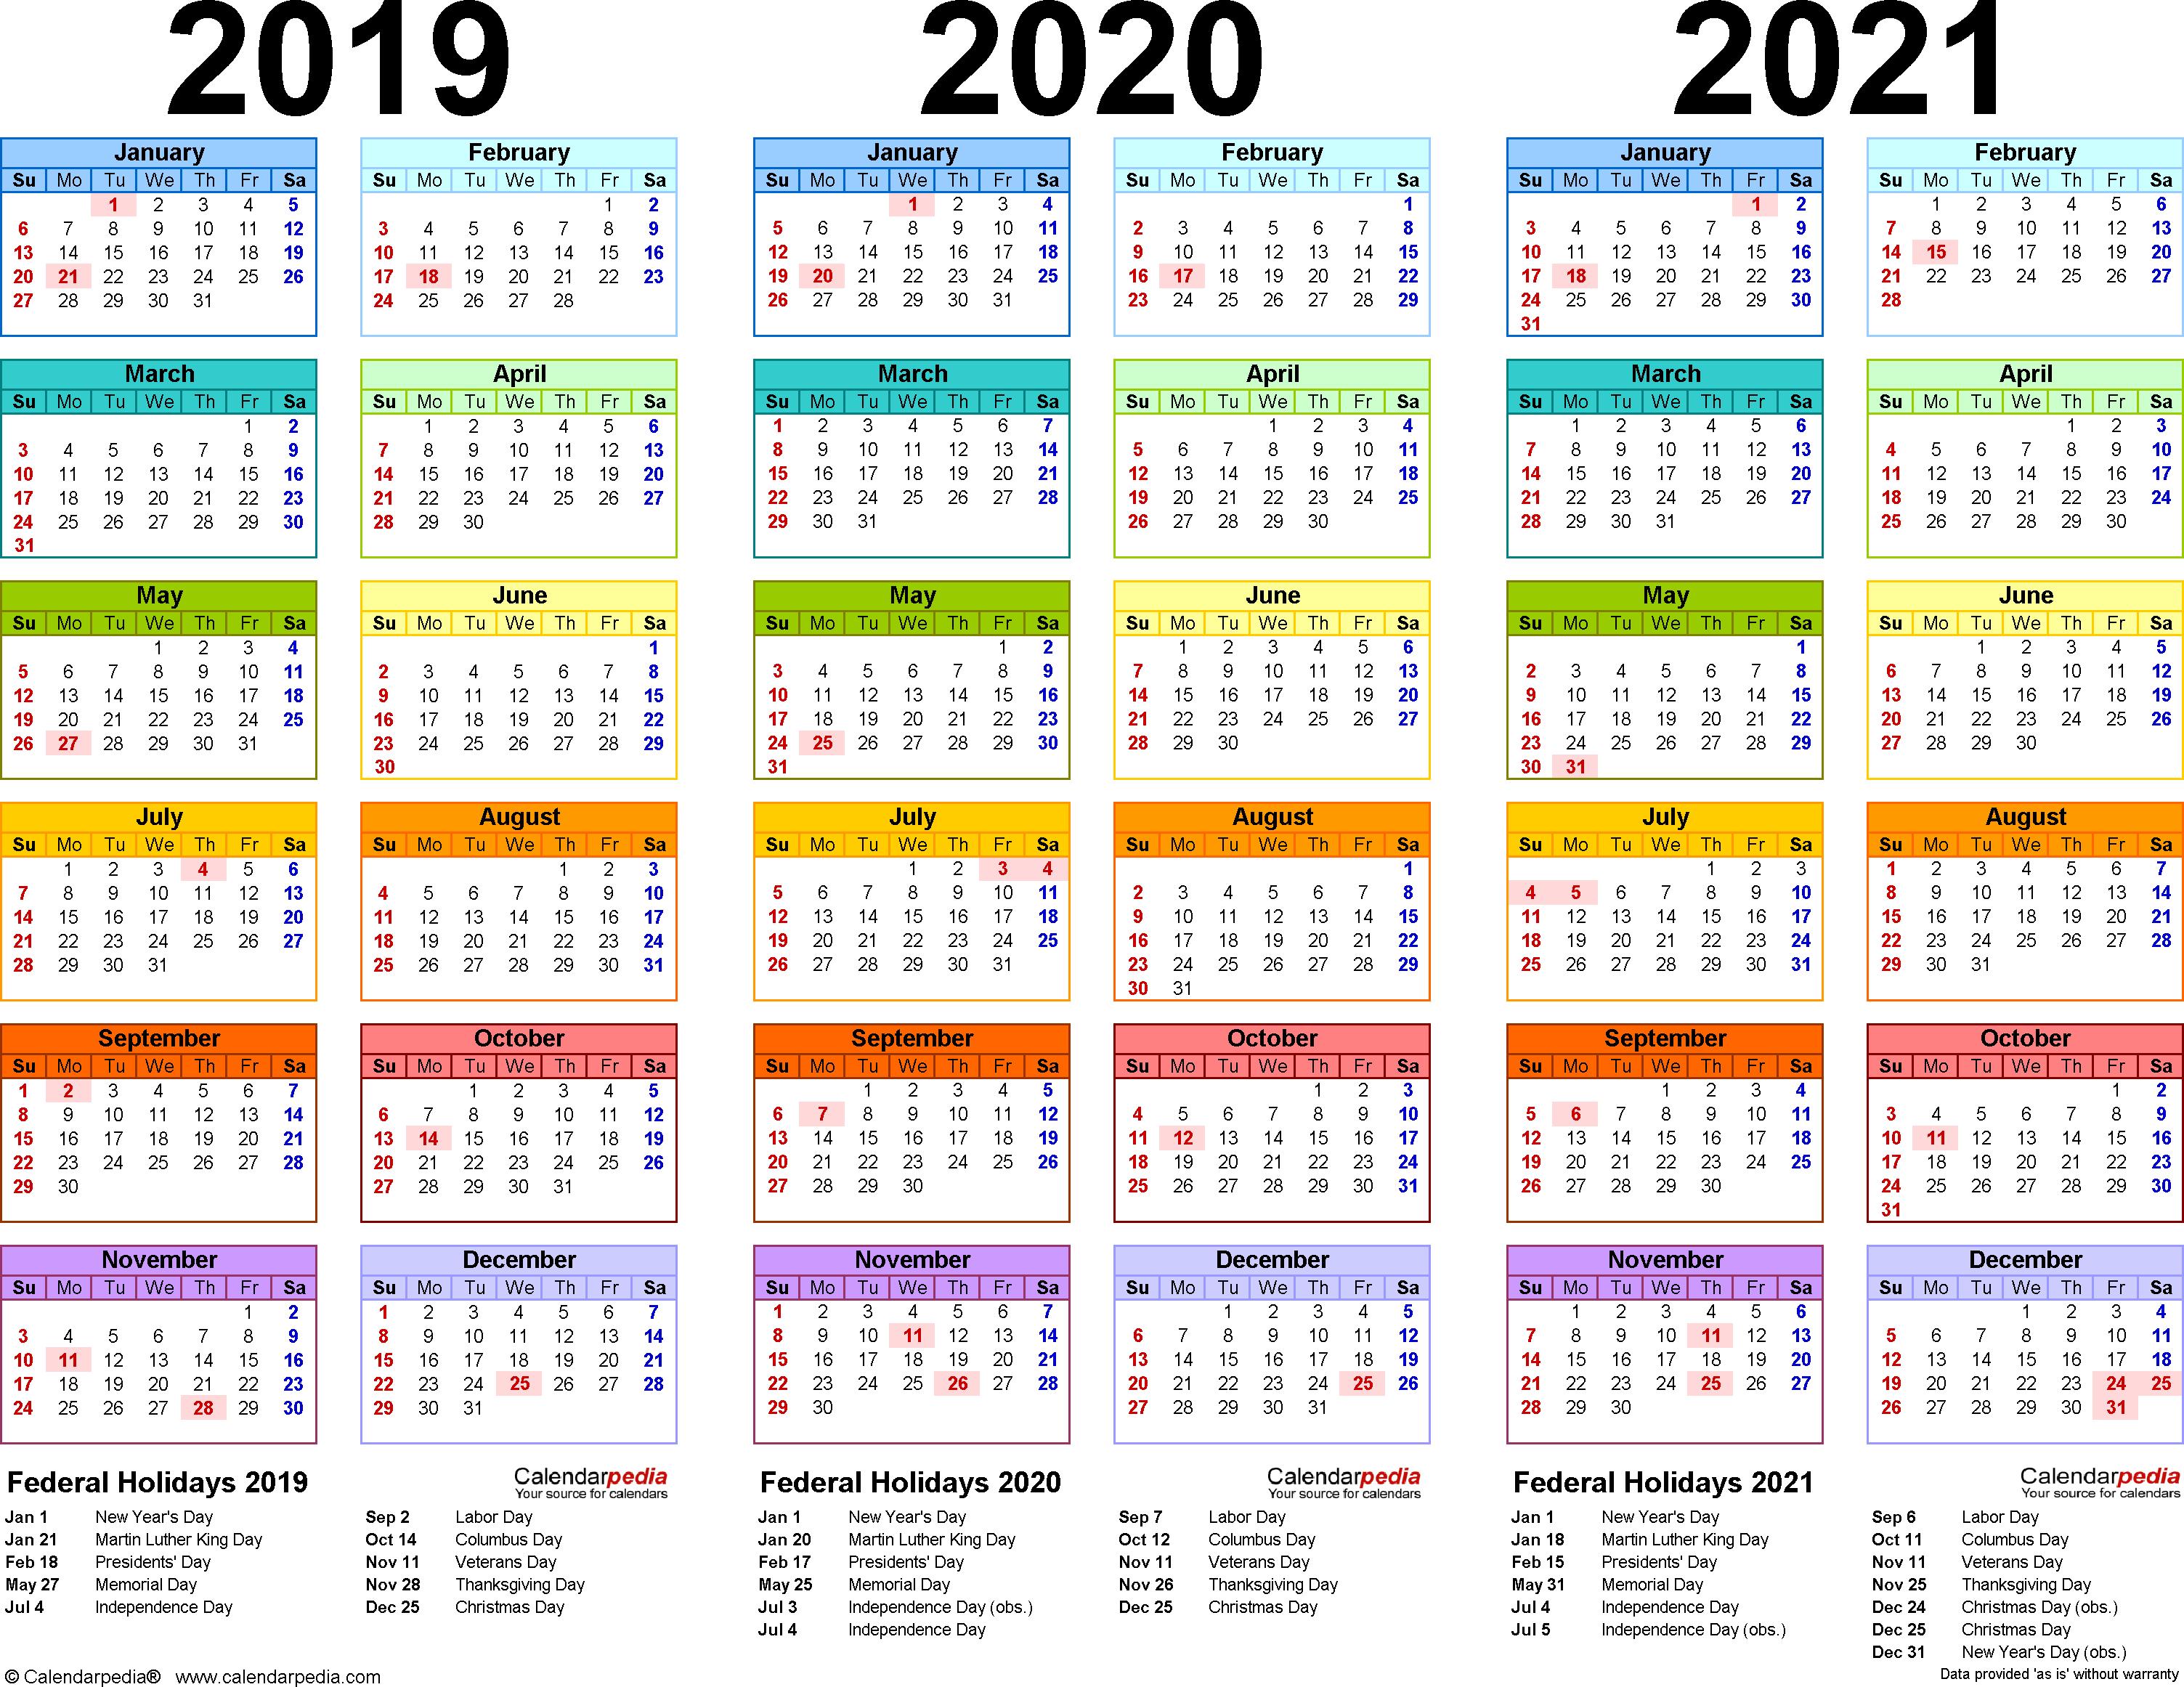 Printable 3 Year Calendar 2019 To 2021 | Printable Calendar 2019 within 3 Year Calendar Printable 2018 2019 2020